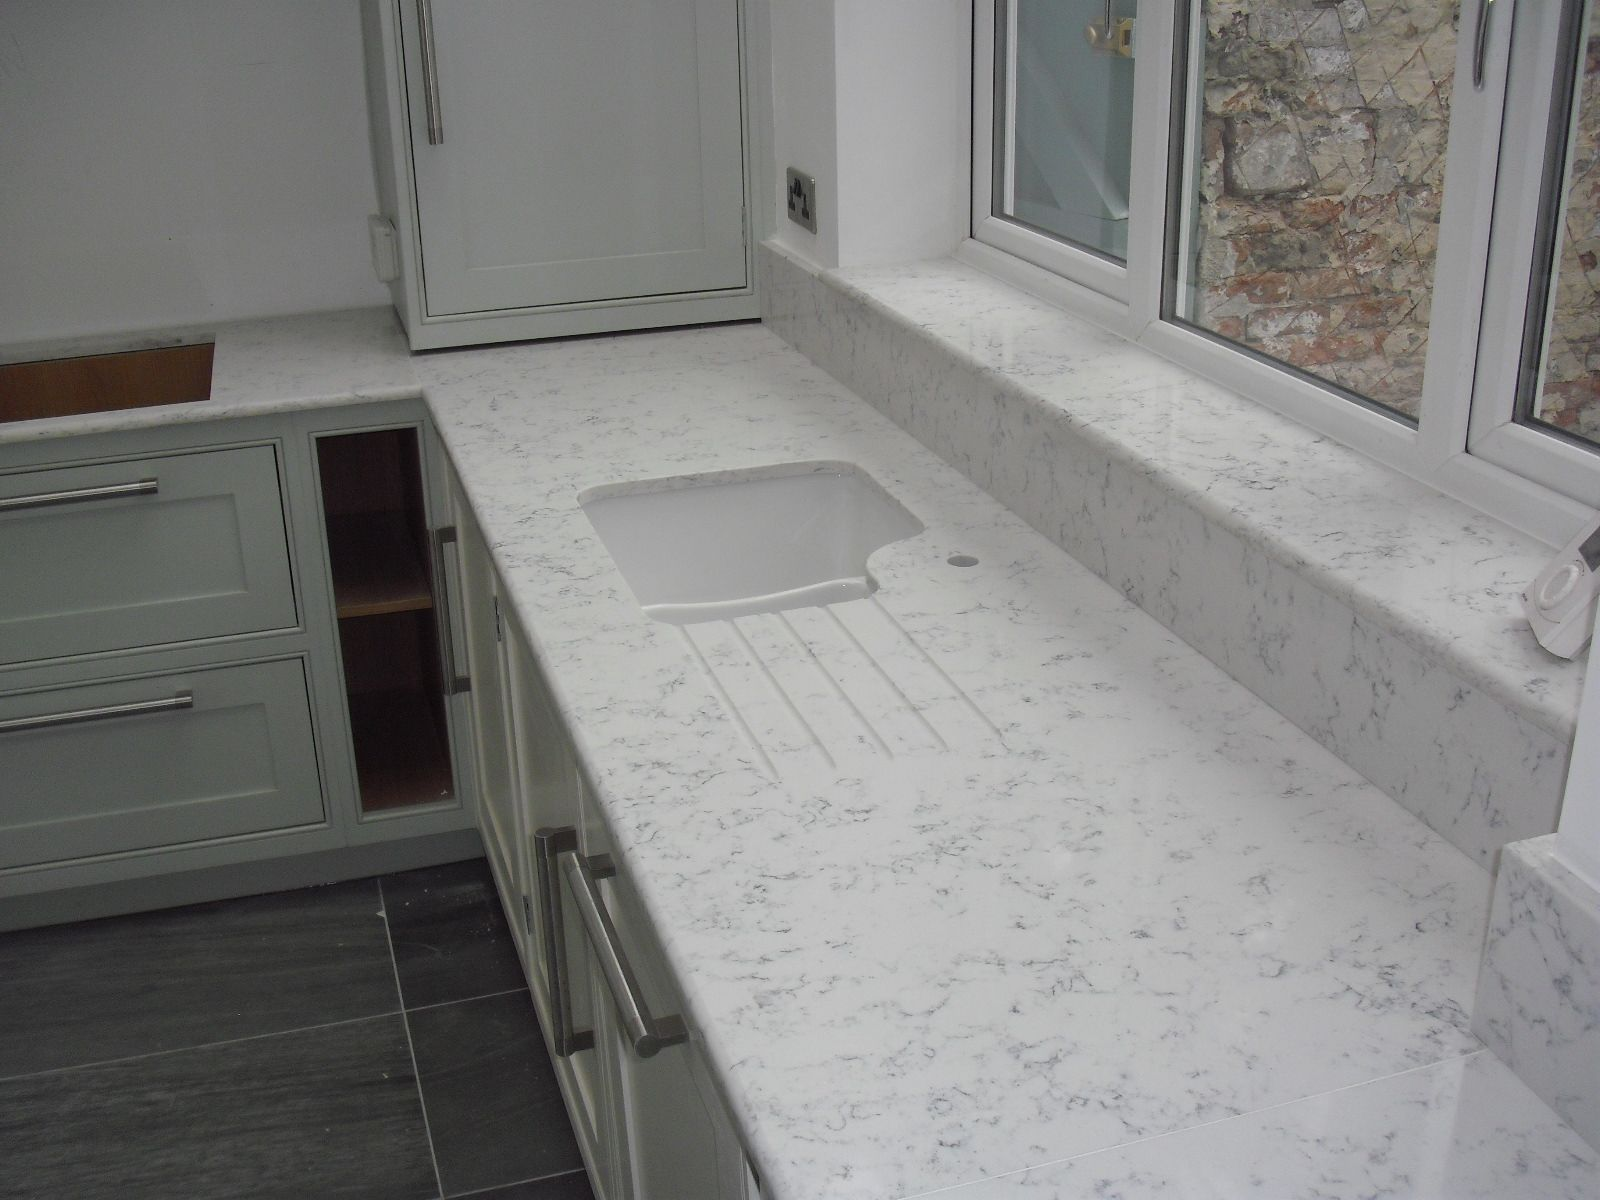 Lyra Quartz Worktops By Silestone Under The Window Sill In The Same Material Kitchen